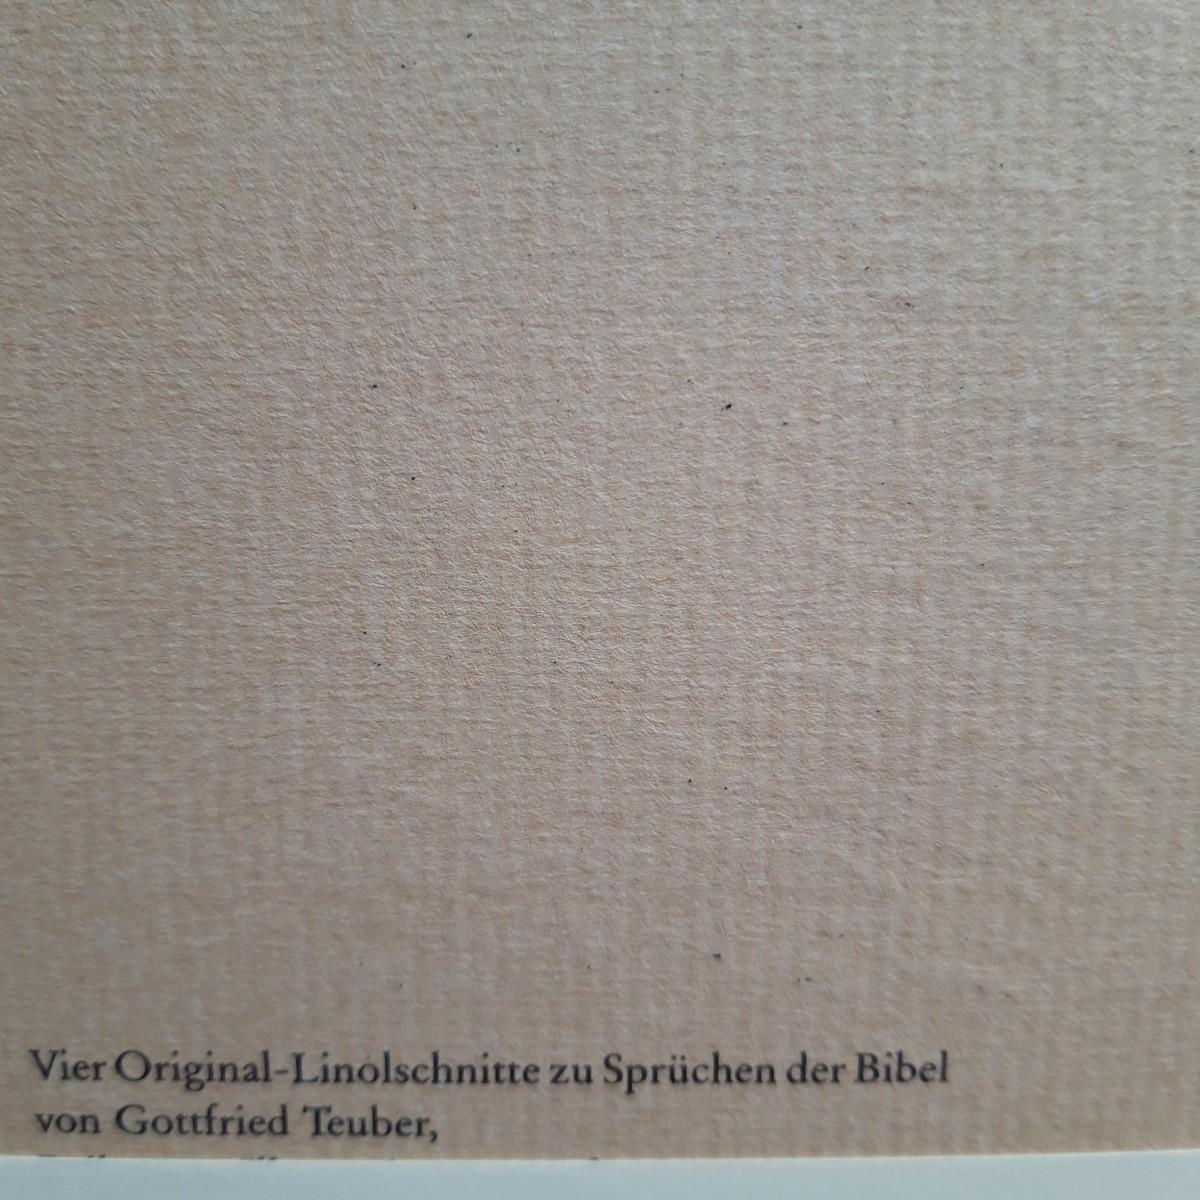 Gottfried Teuber - 4 Linolschnitte auf Faltblatt, signiert, 1995 kopen? Bied vanaf 55!